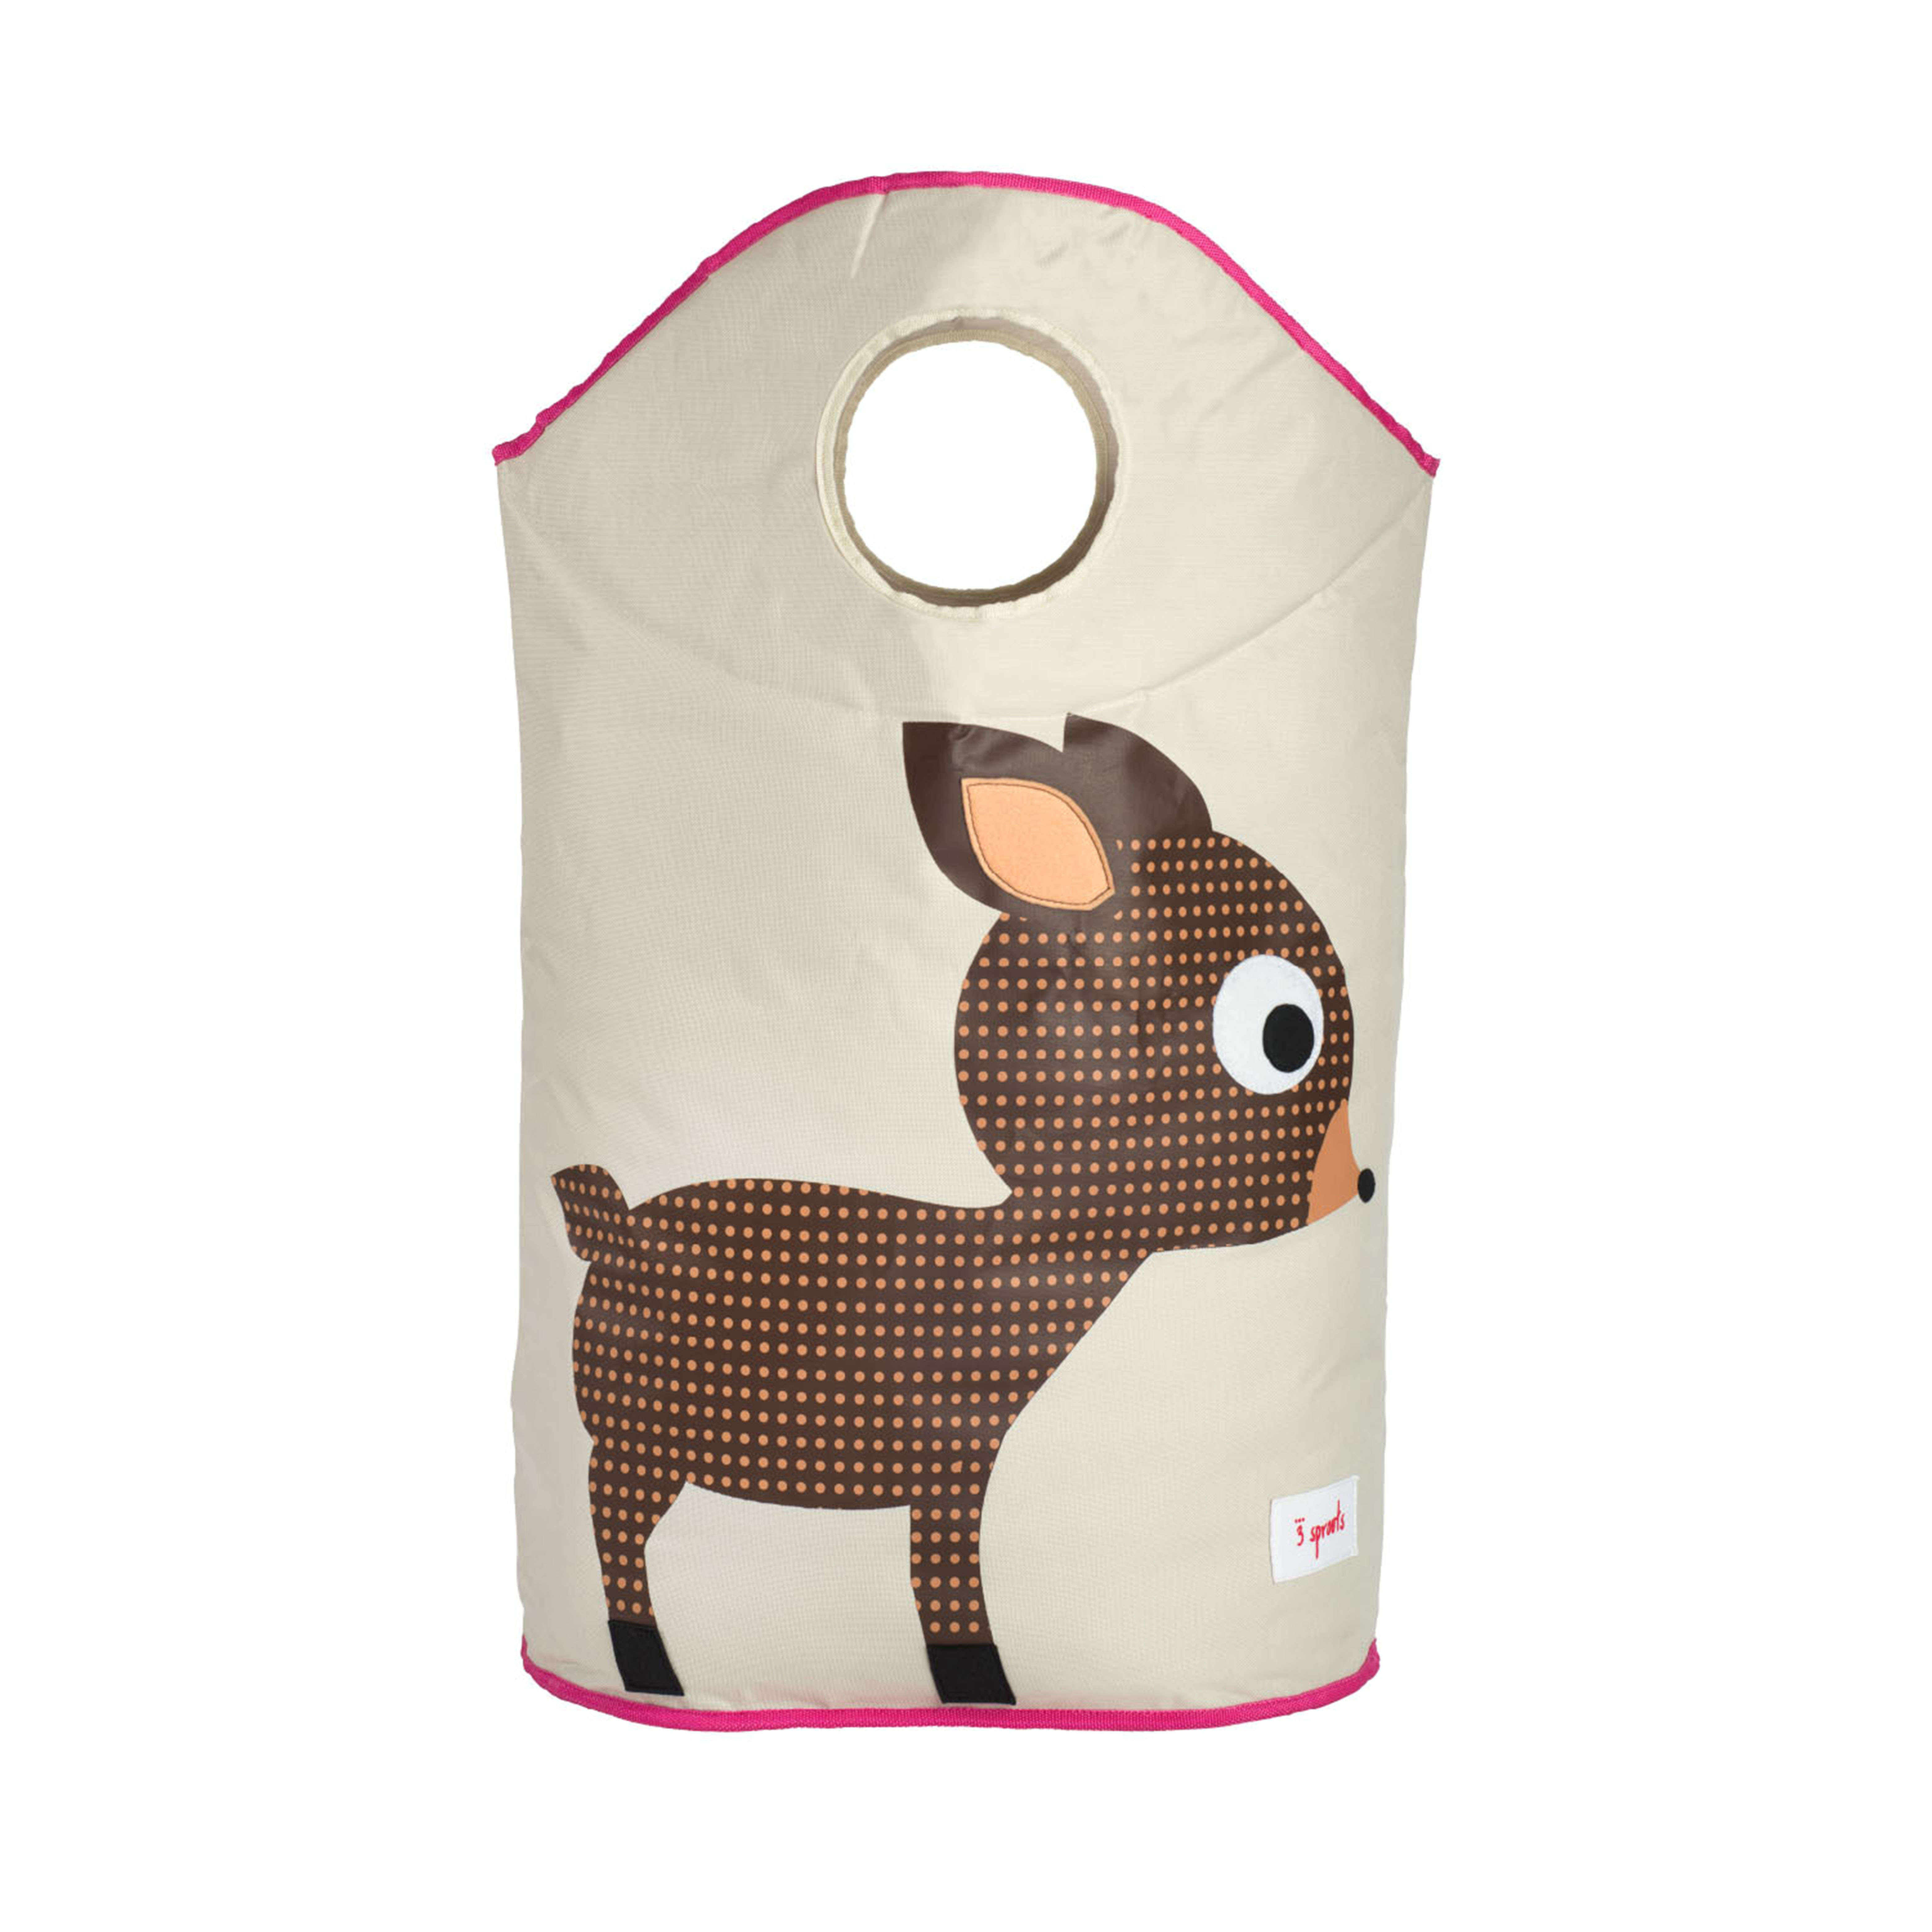 3 Sprouts - Laundry Hamper - Brown Deer